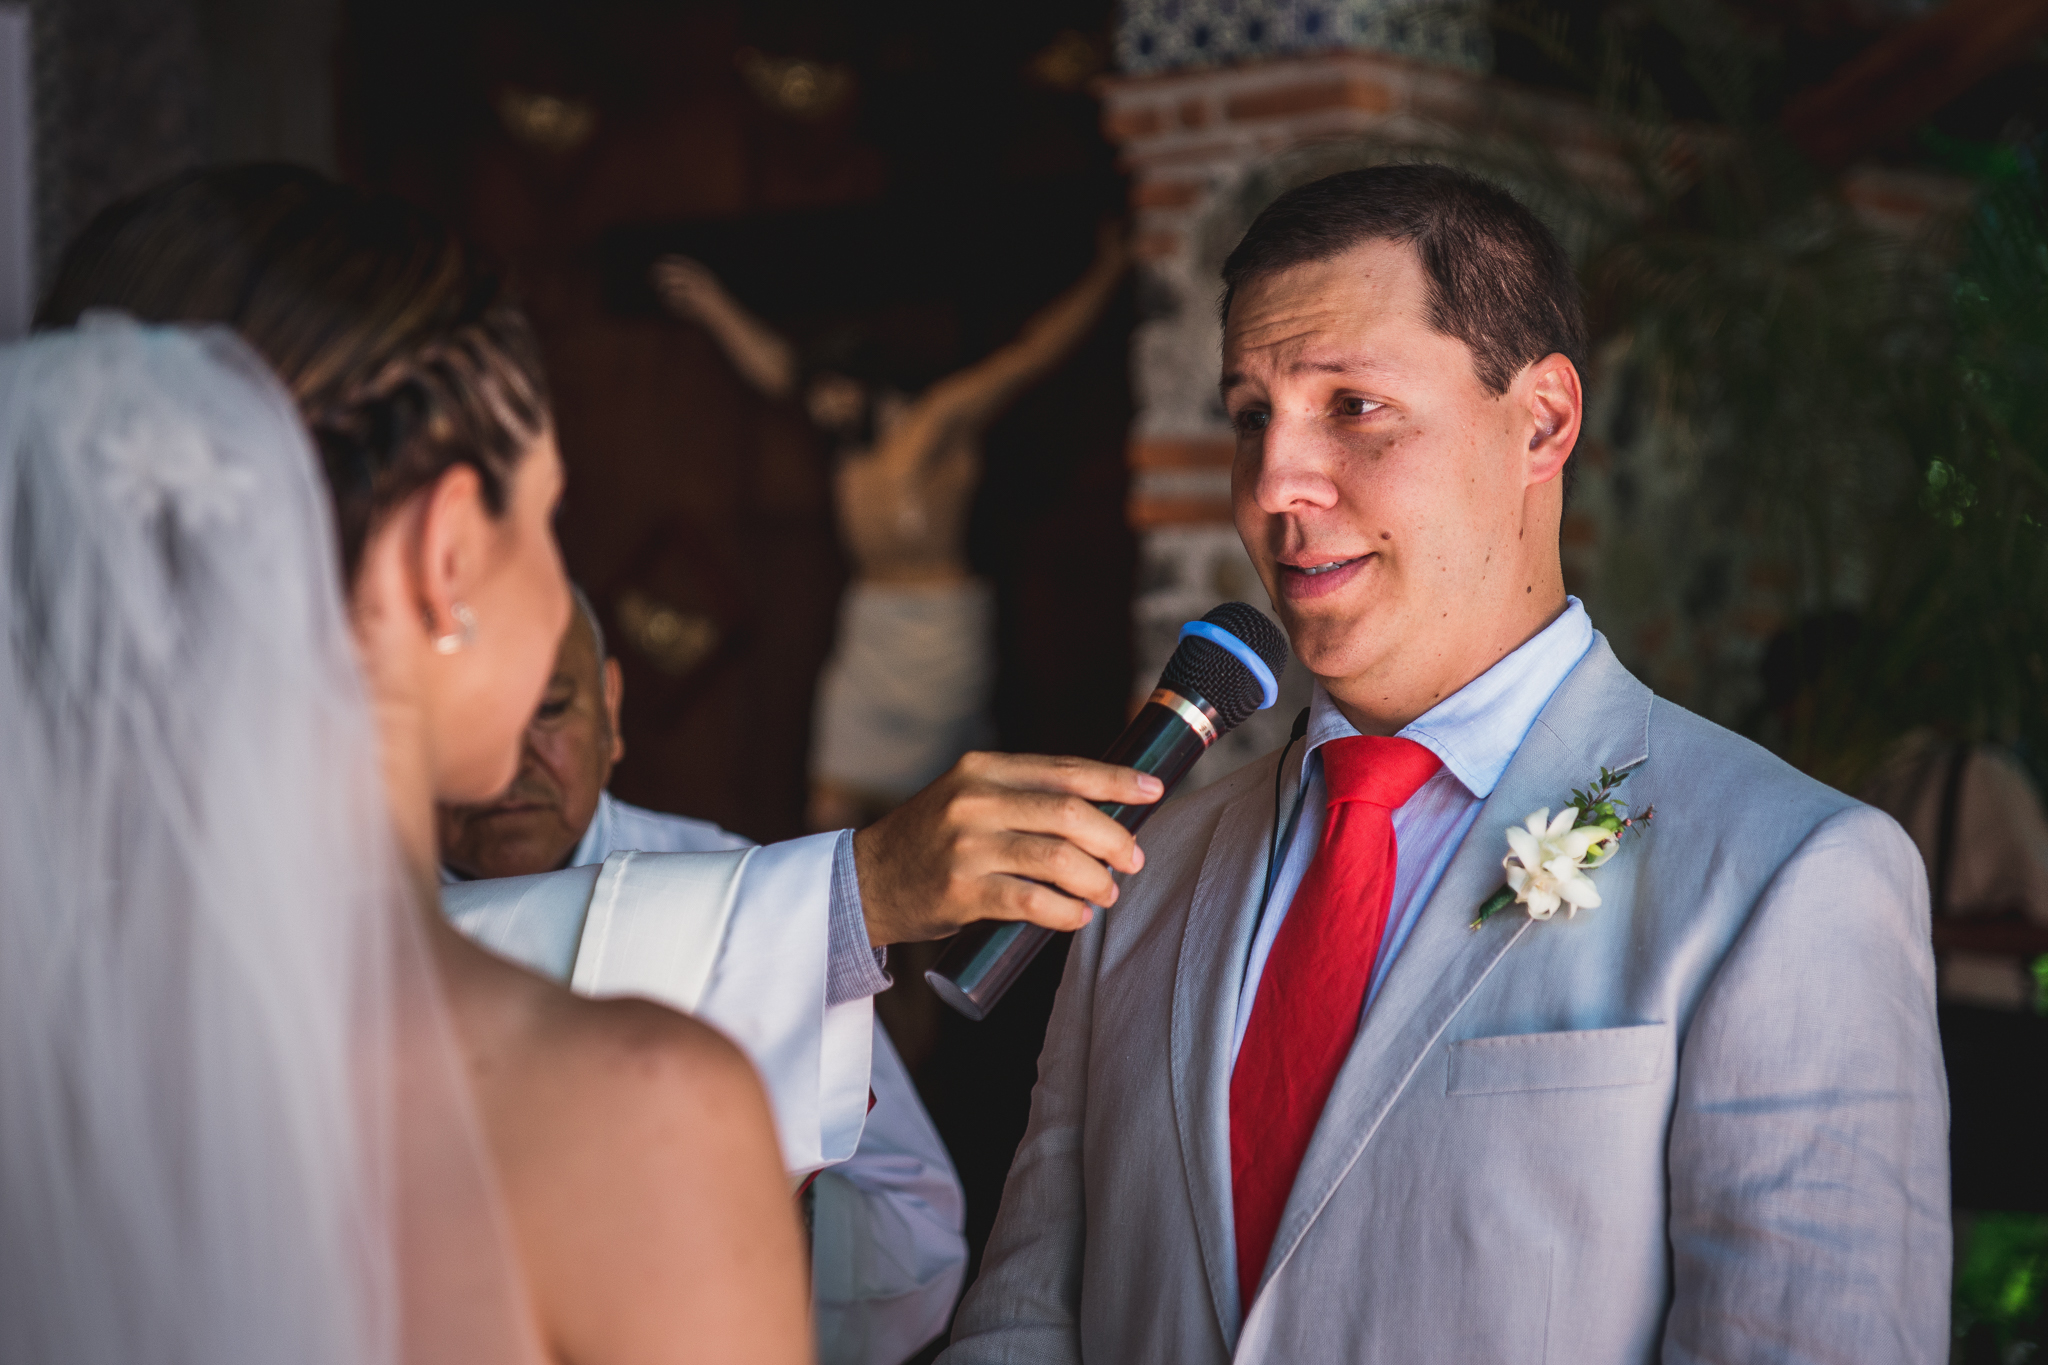 wedding-photography-mexico-quinta-rubelinas-38.jpg